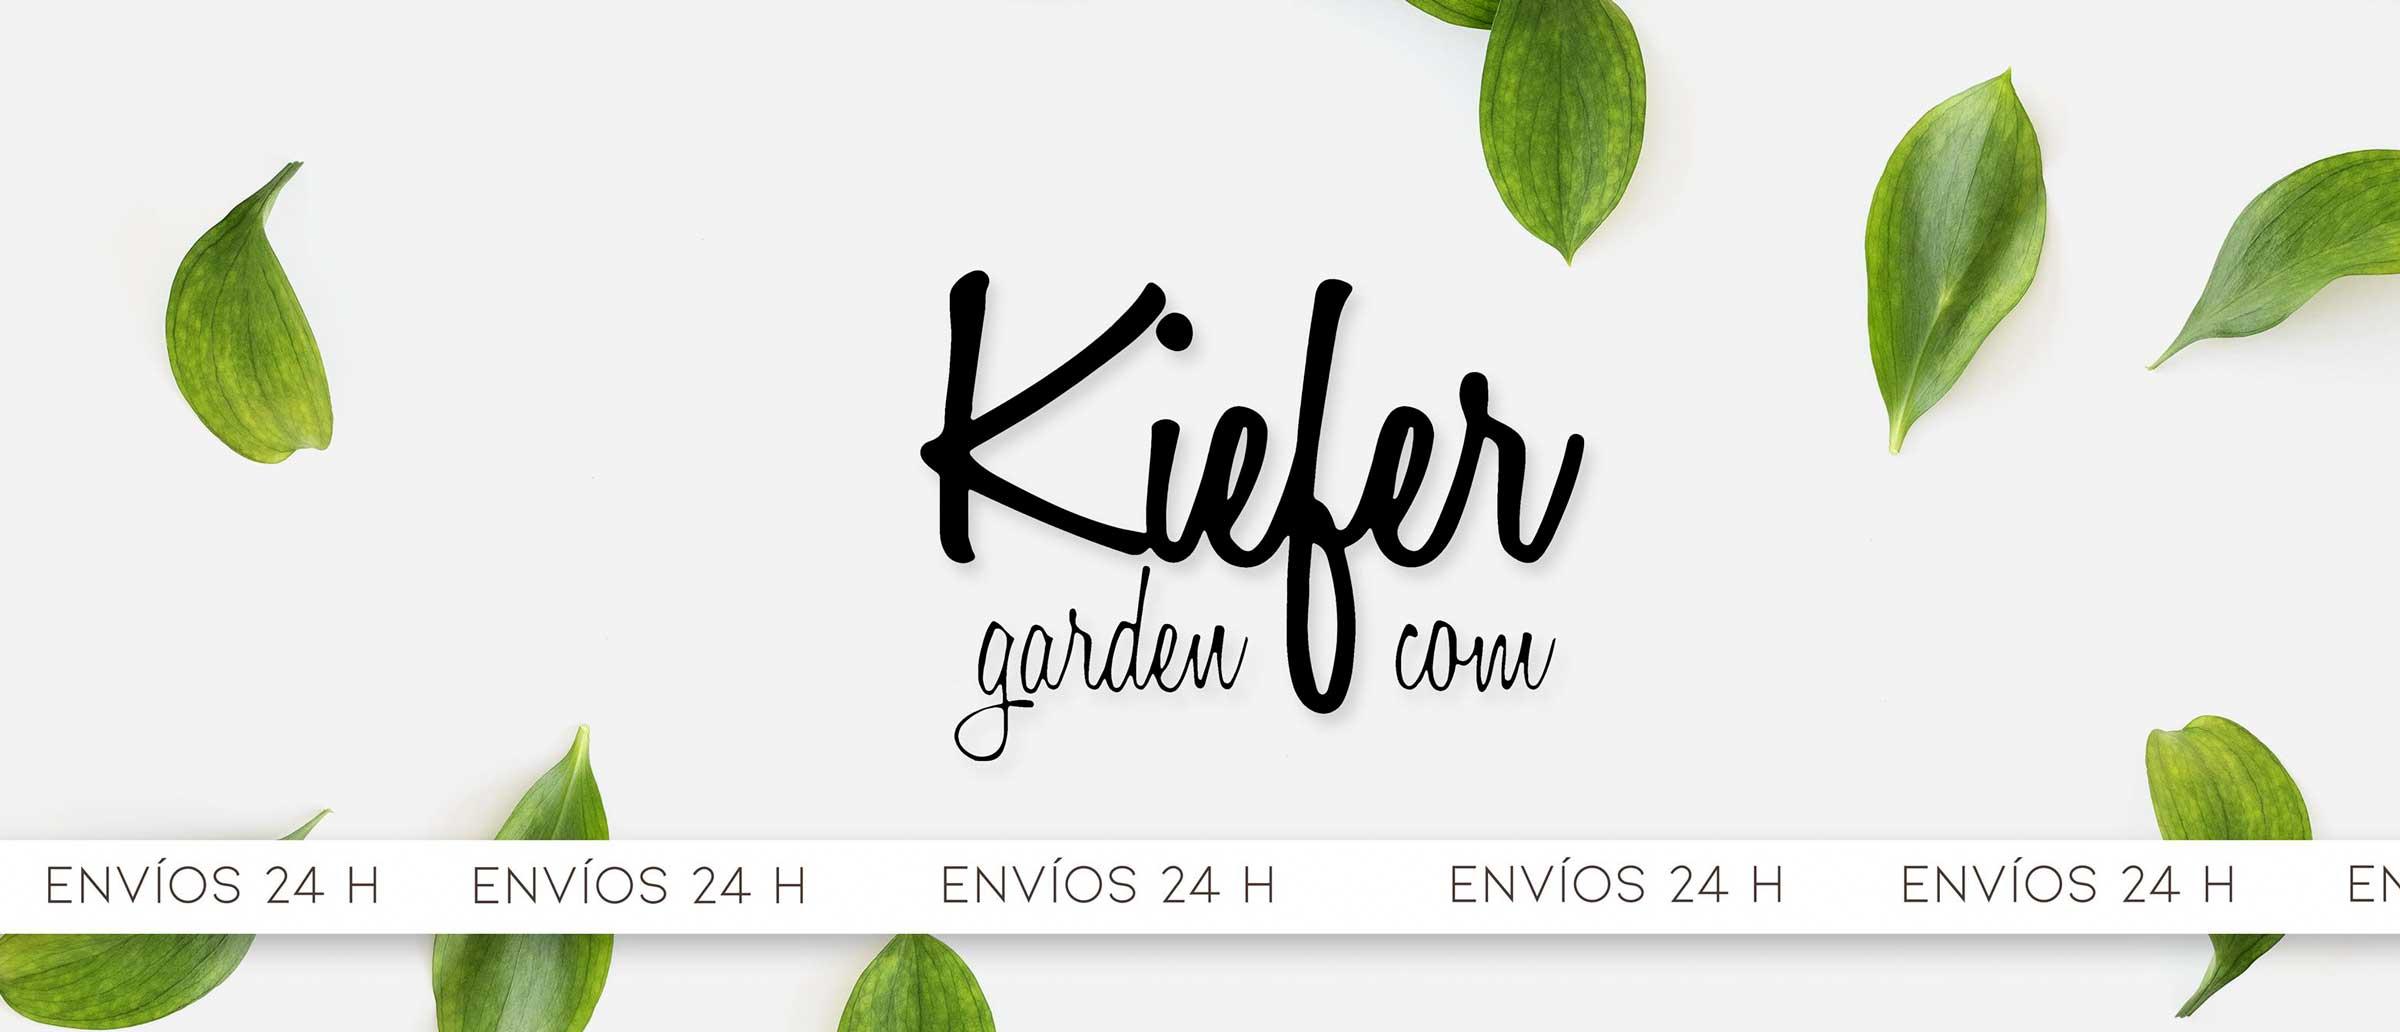 Casos de clientes: Kiefergarden